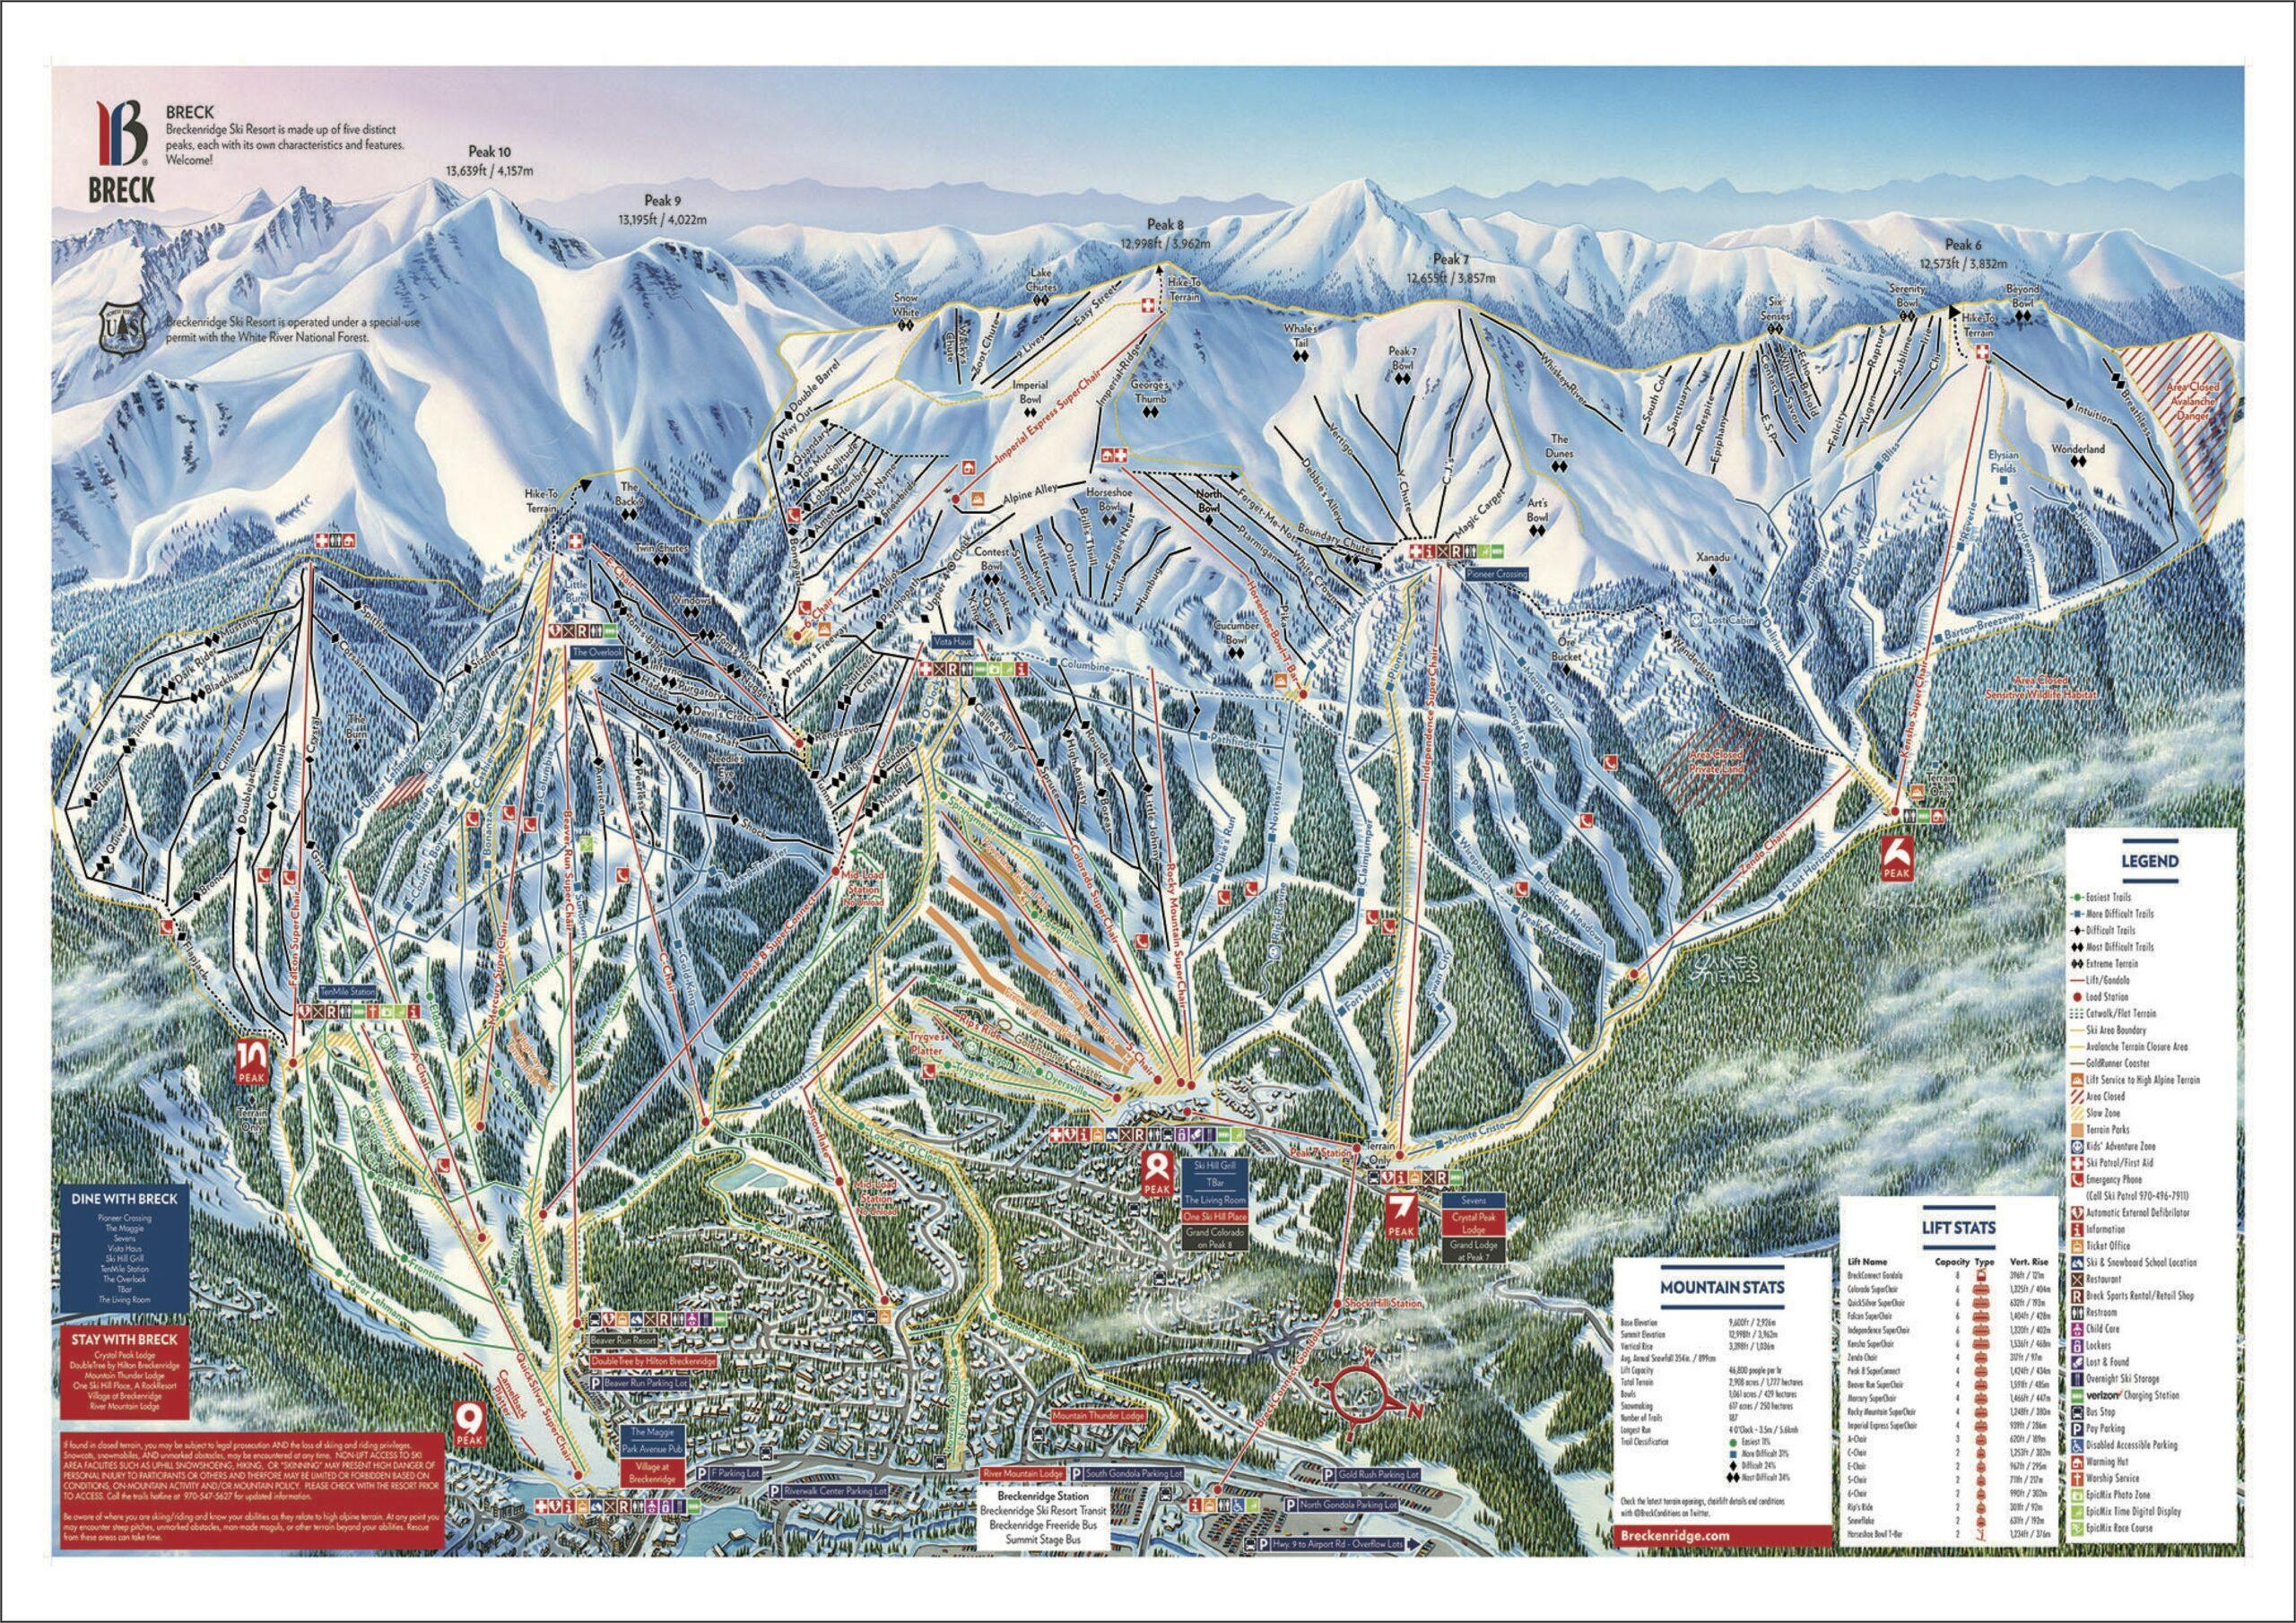 Breckenridge Ski Resort Lodging Map